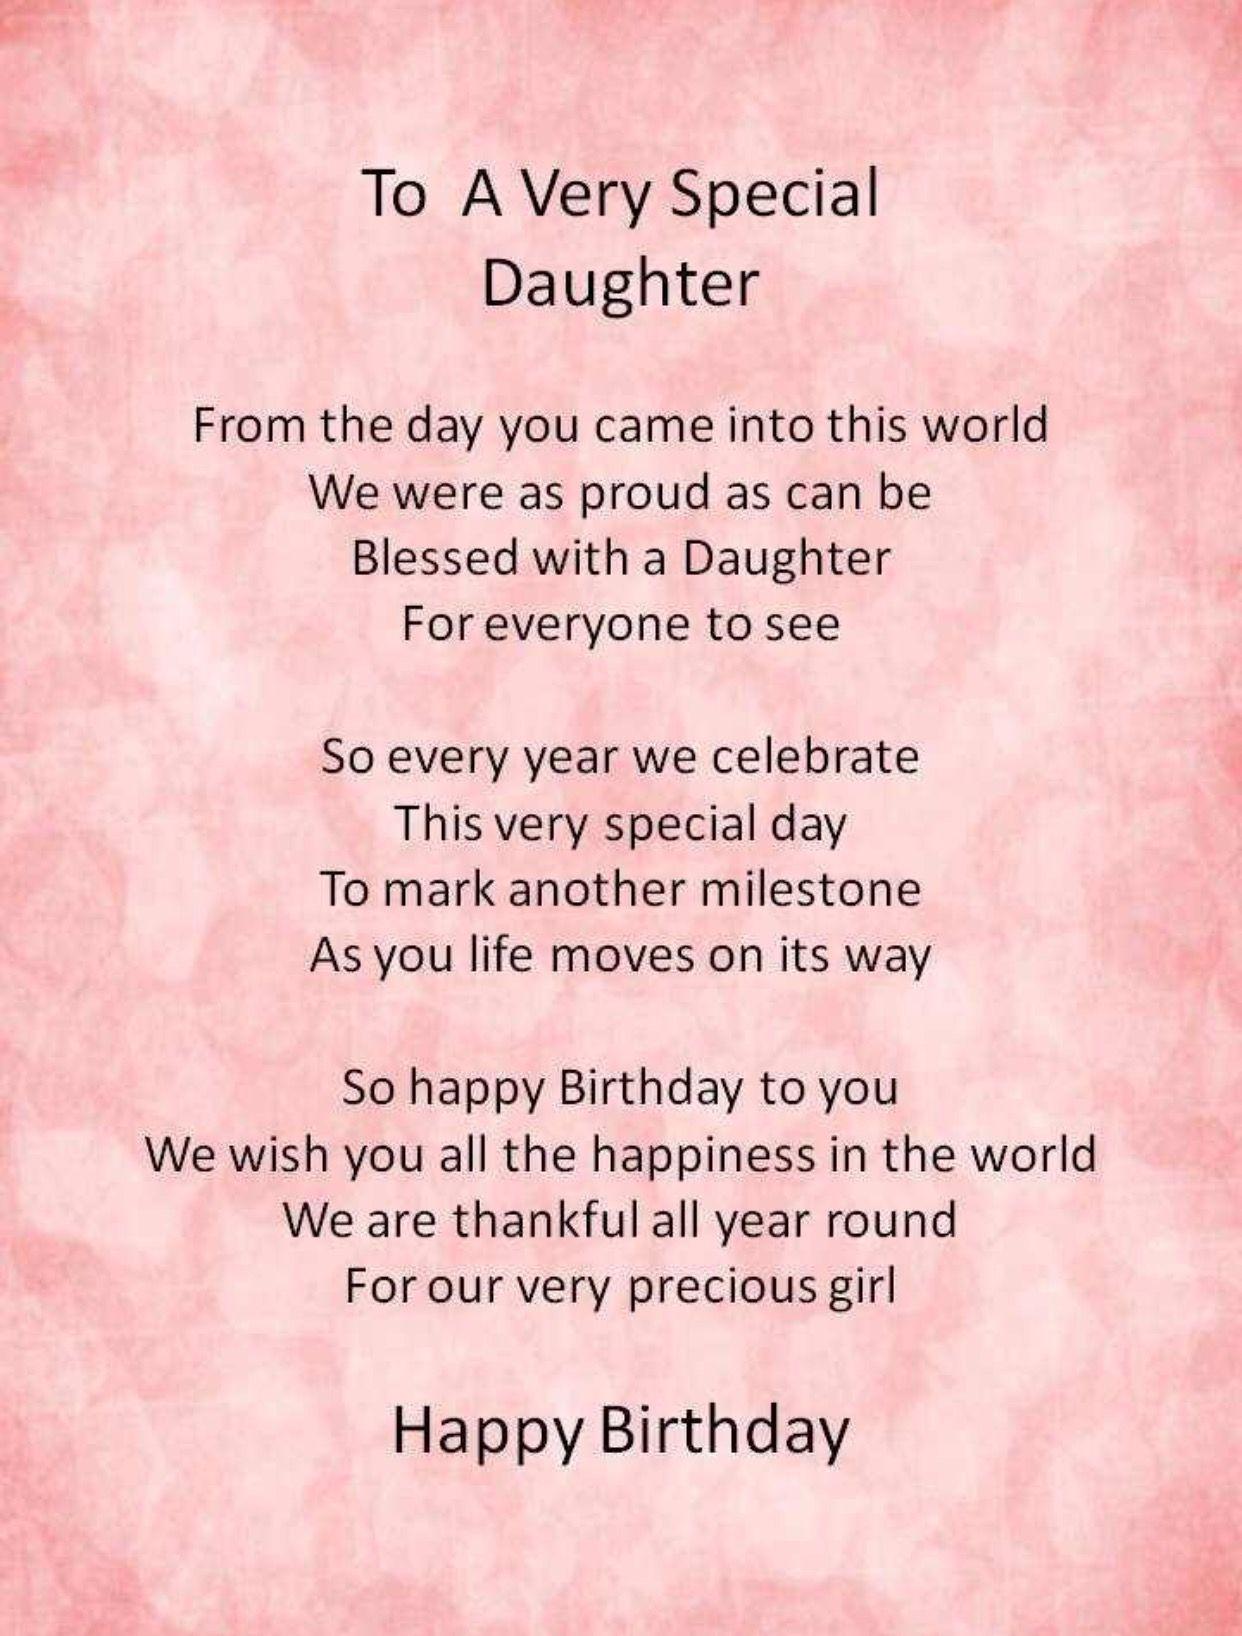 Pin by Pr3ttygirl79 on Raising kids! ♥ Happy birthday